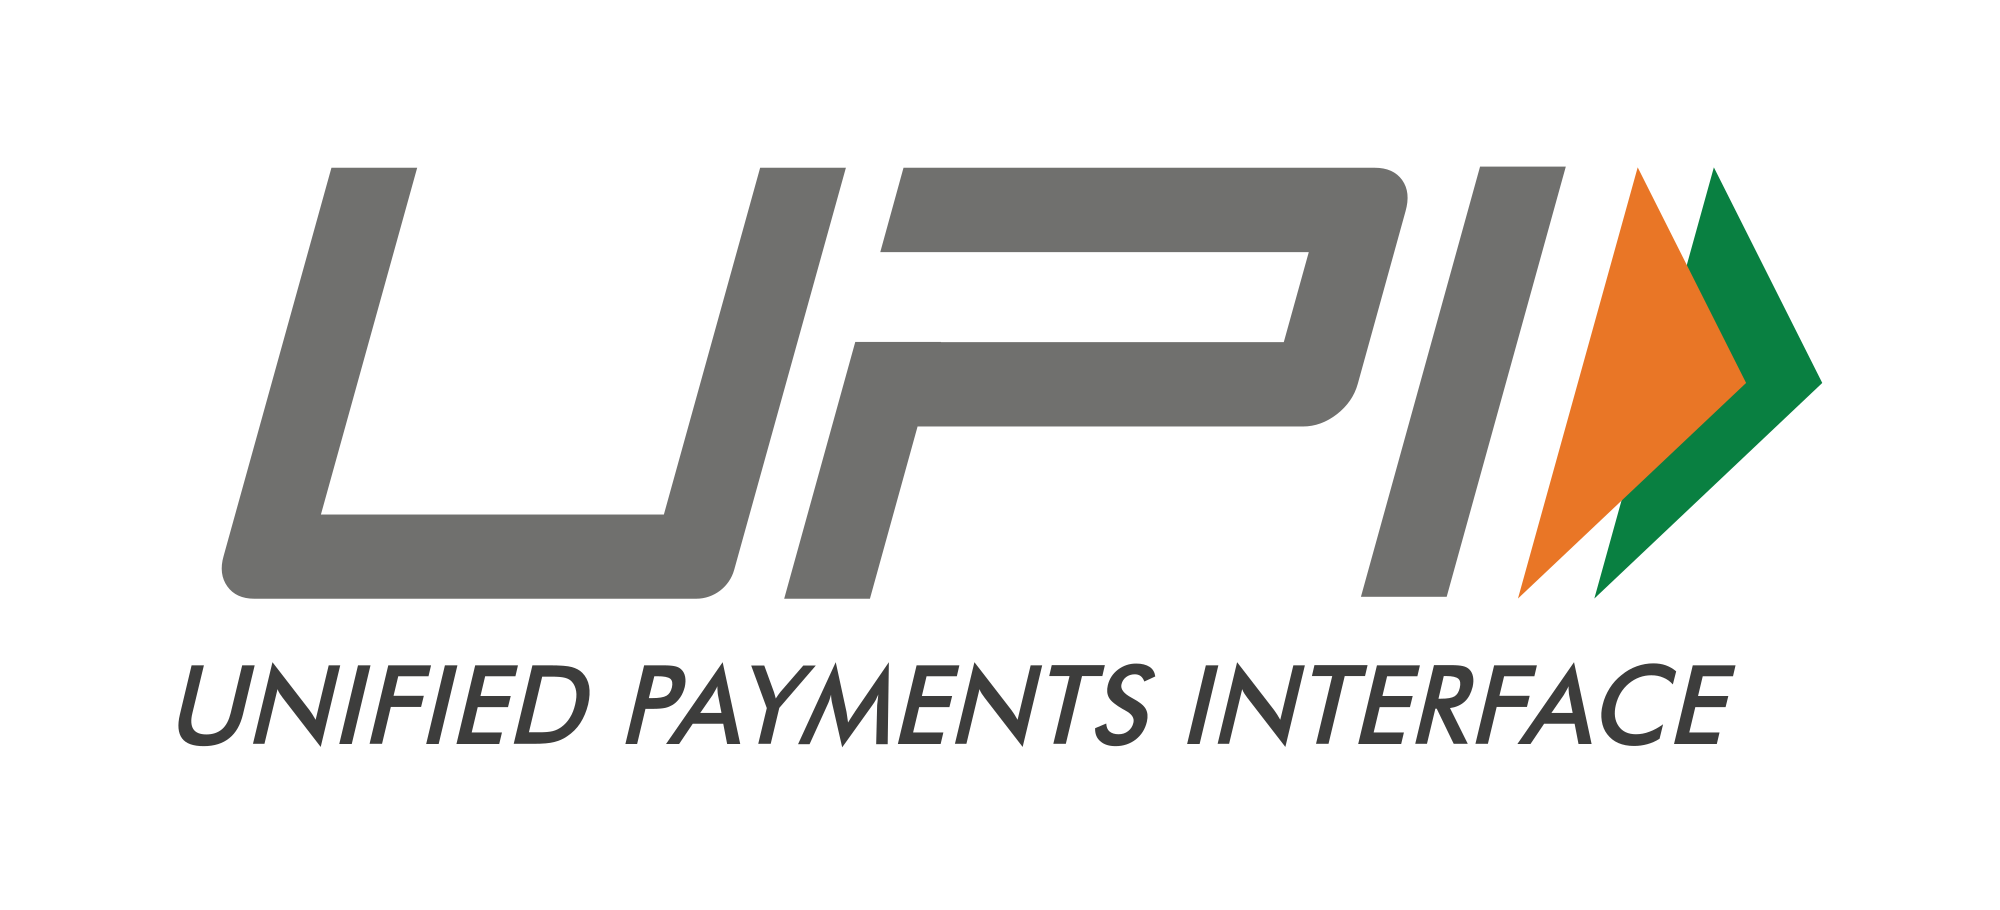 2000x910 Fileupi Logo Vector.svg